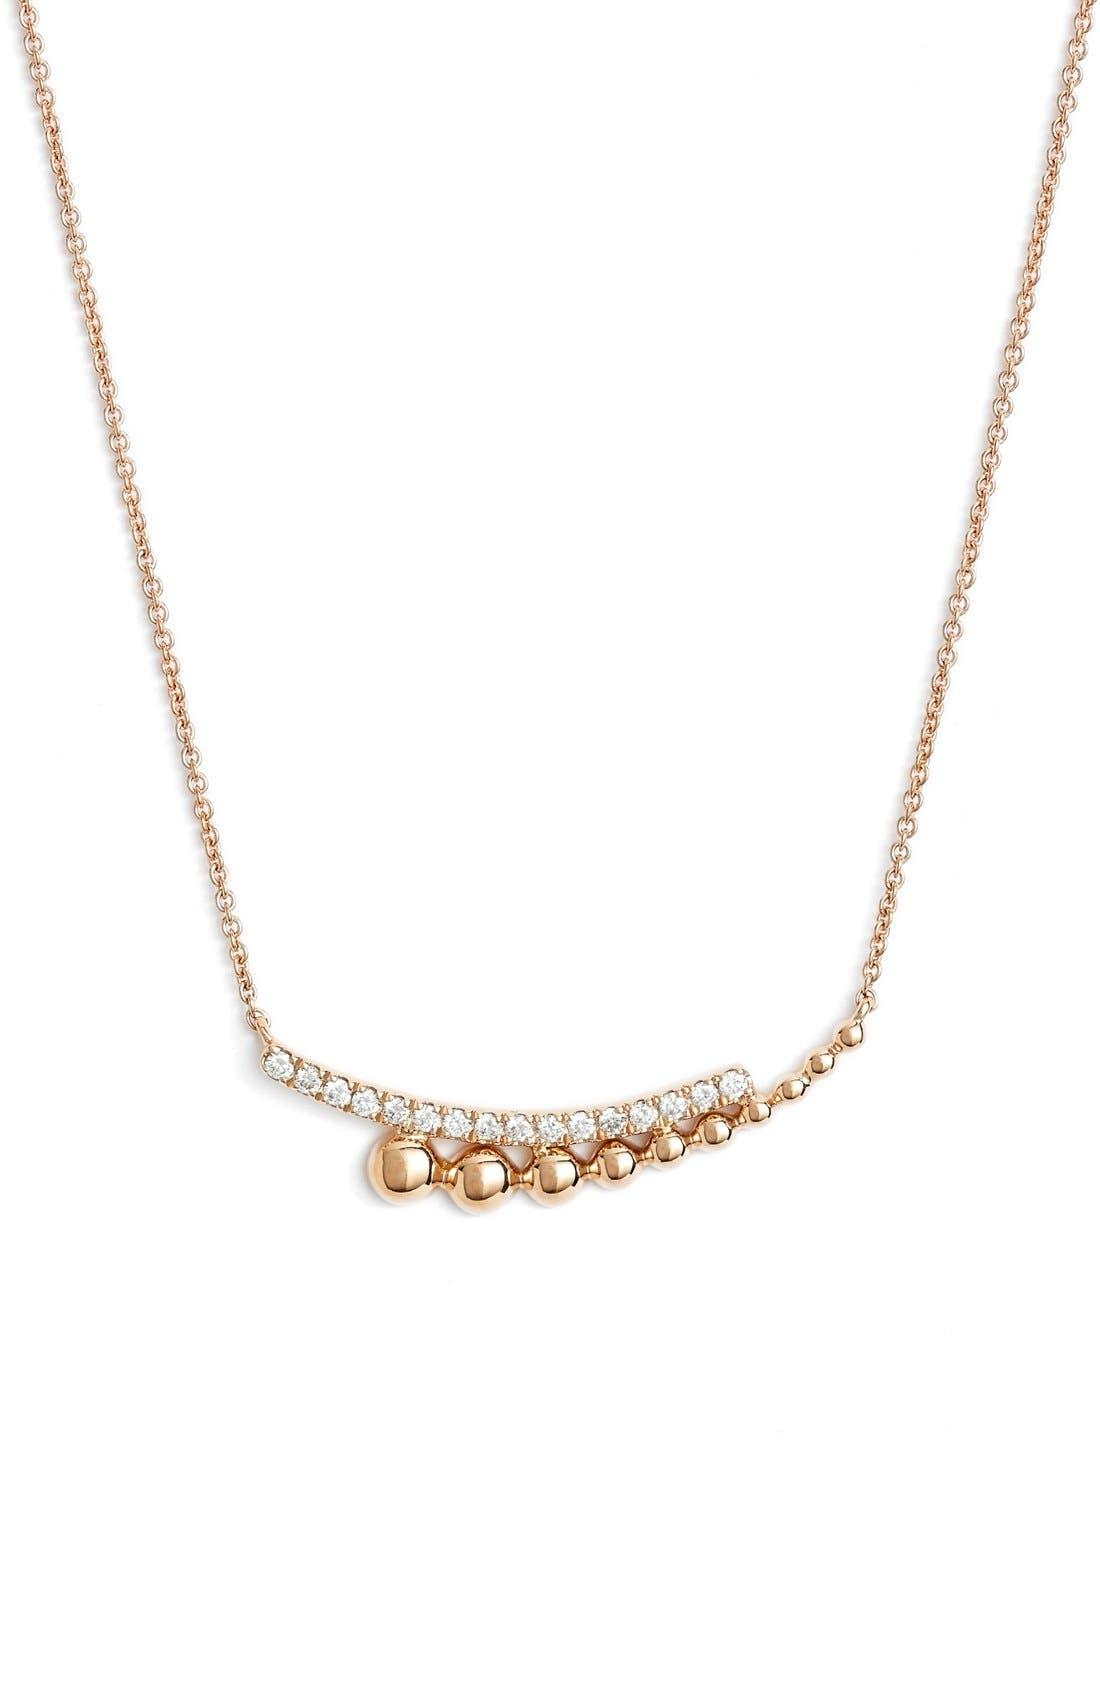 Main Image - Dana Rebecca Designs Poppy Rae Diamond Pendant Necklace